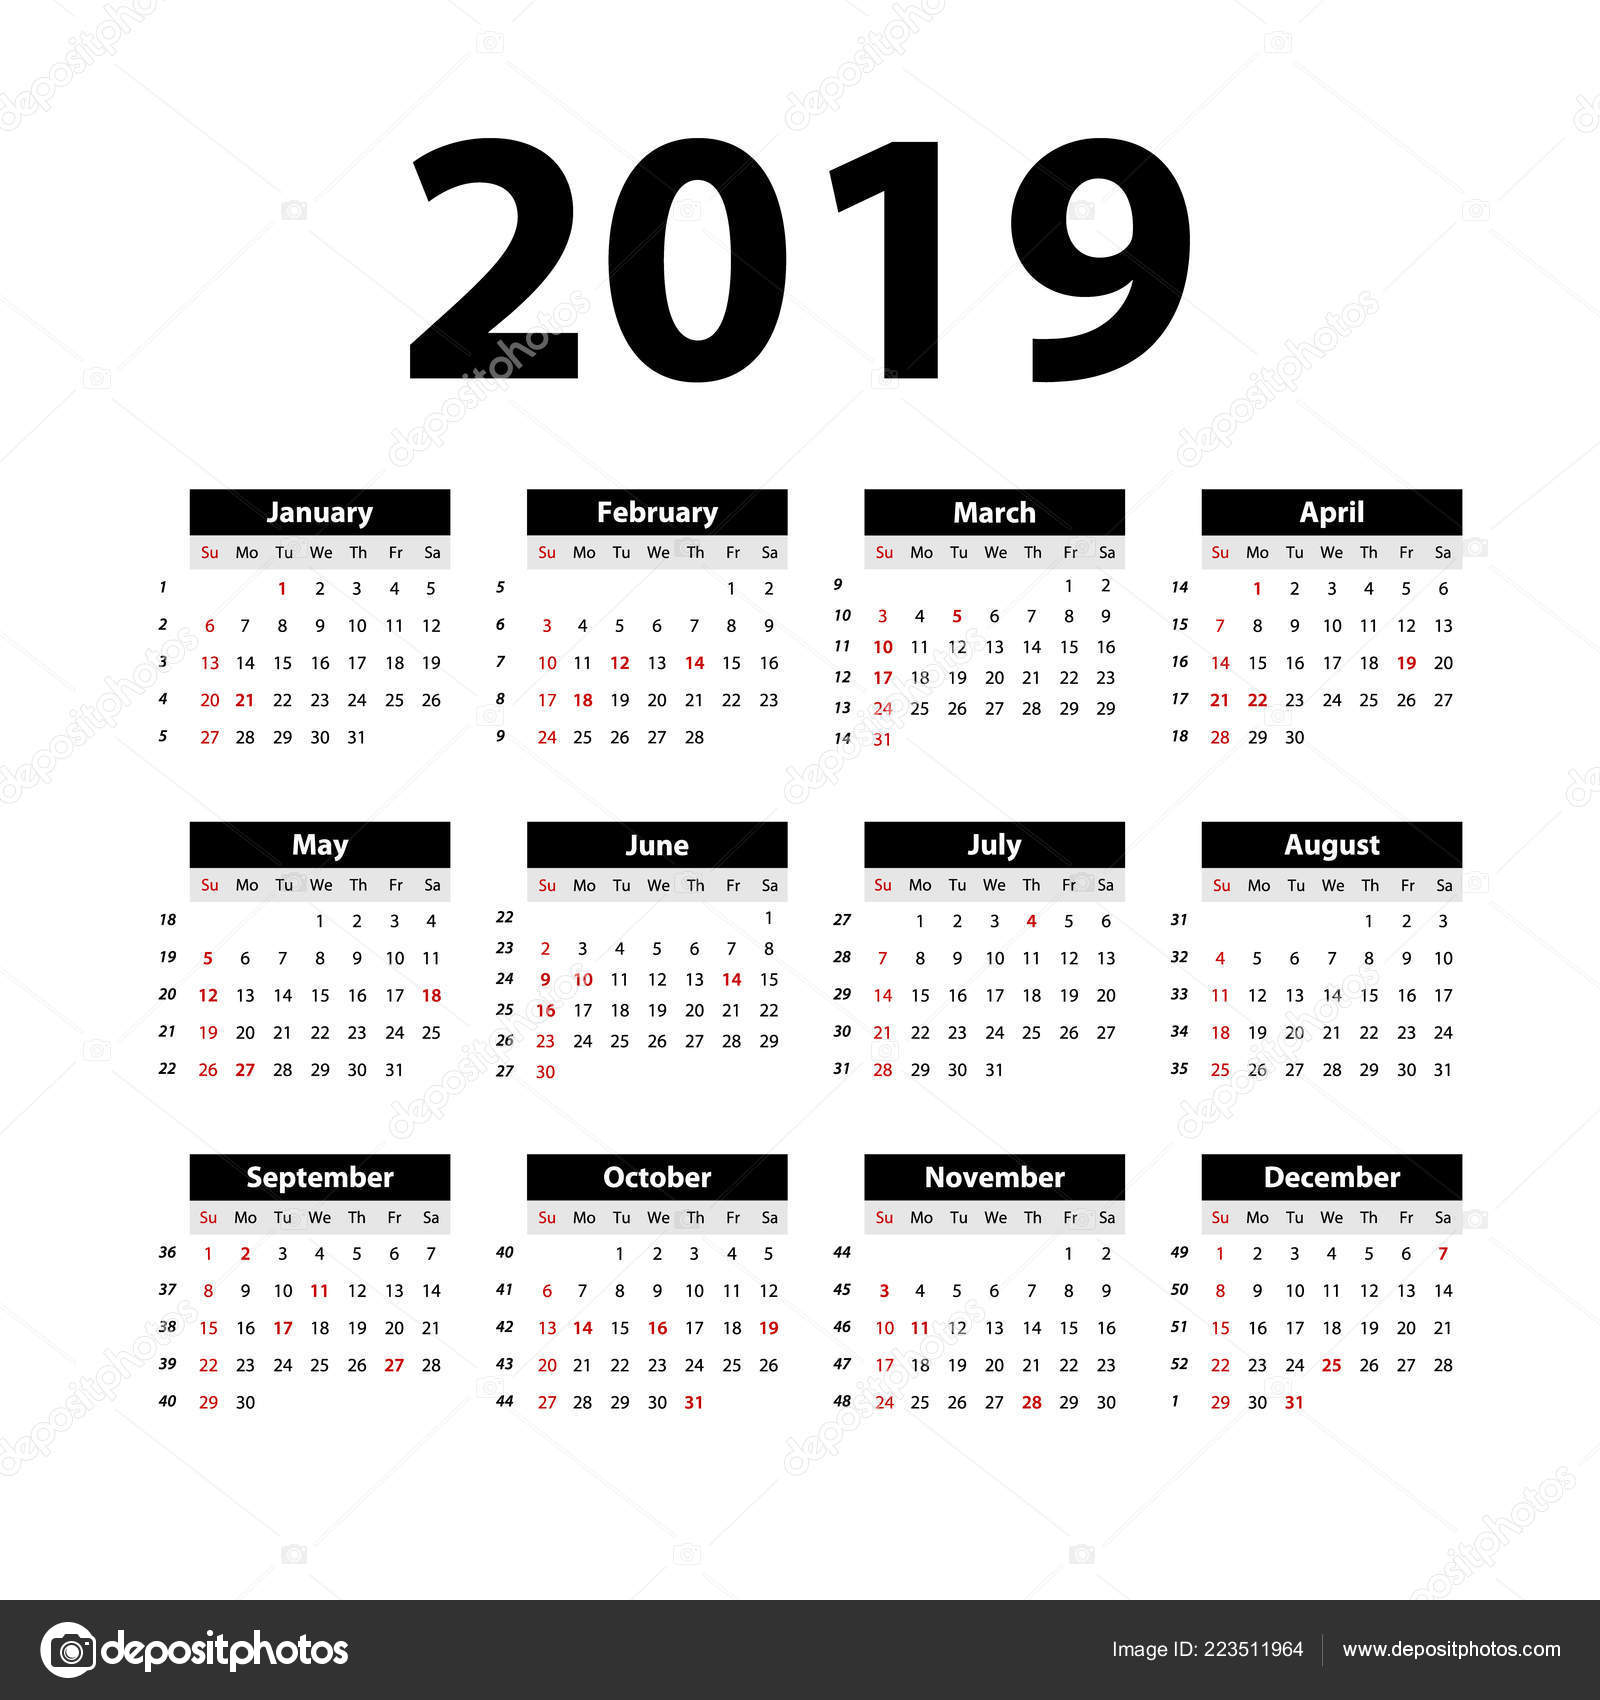 Semaine 34 Calendrier 2019.Vector Calendrier 2019 Noir Semaine Commence Dimanche